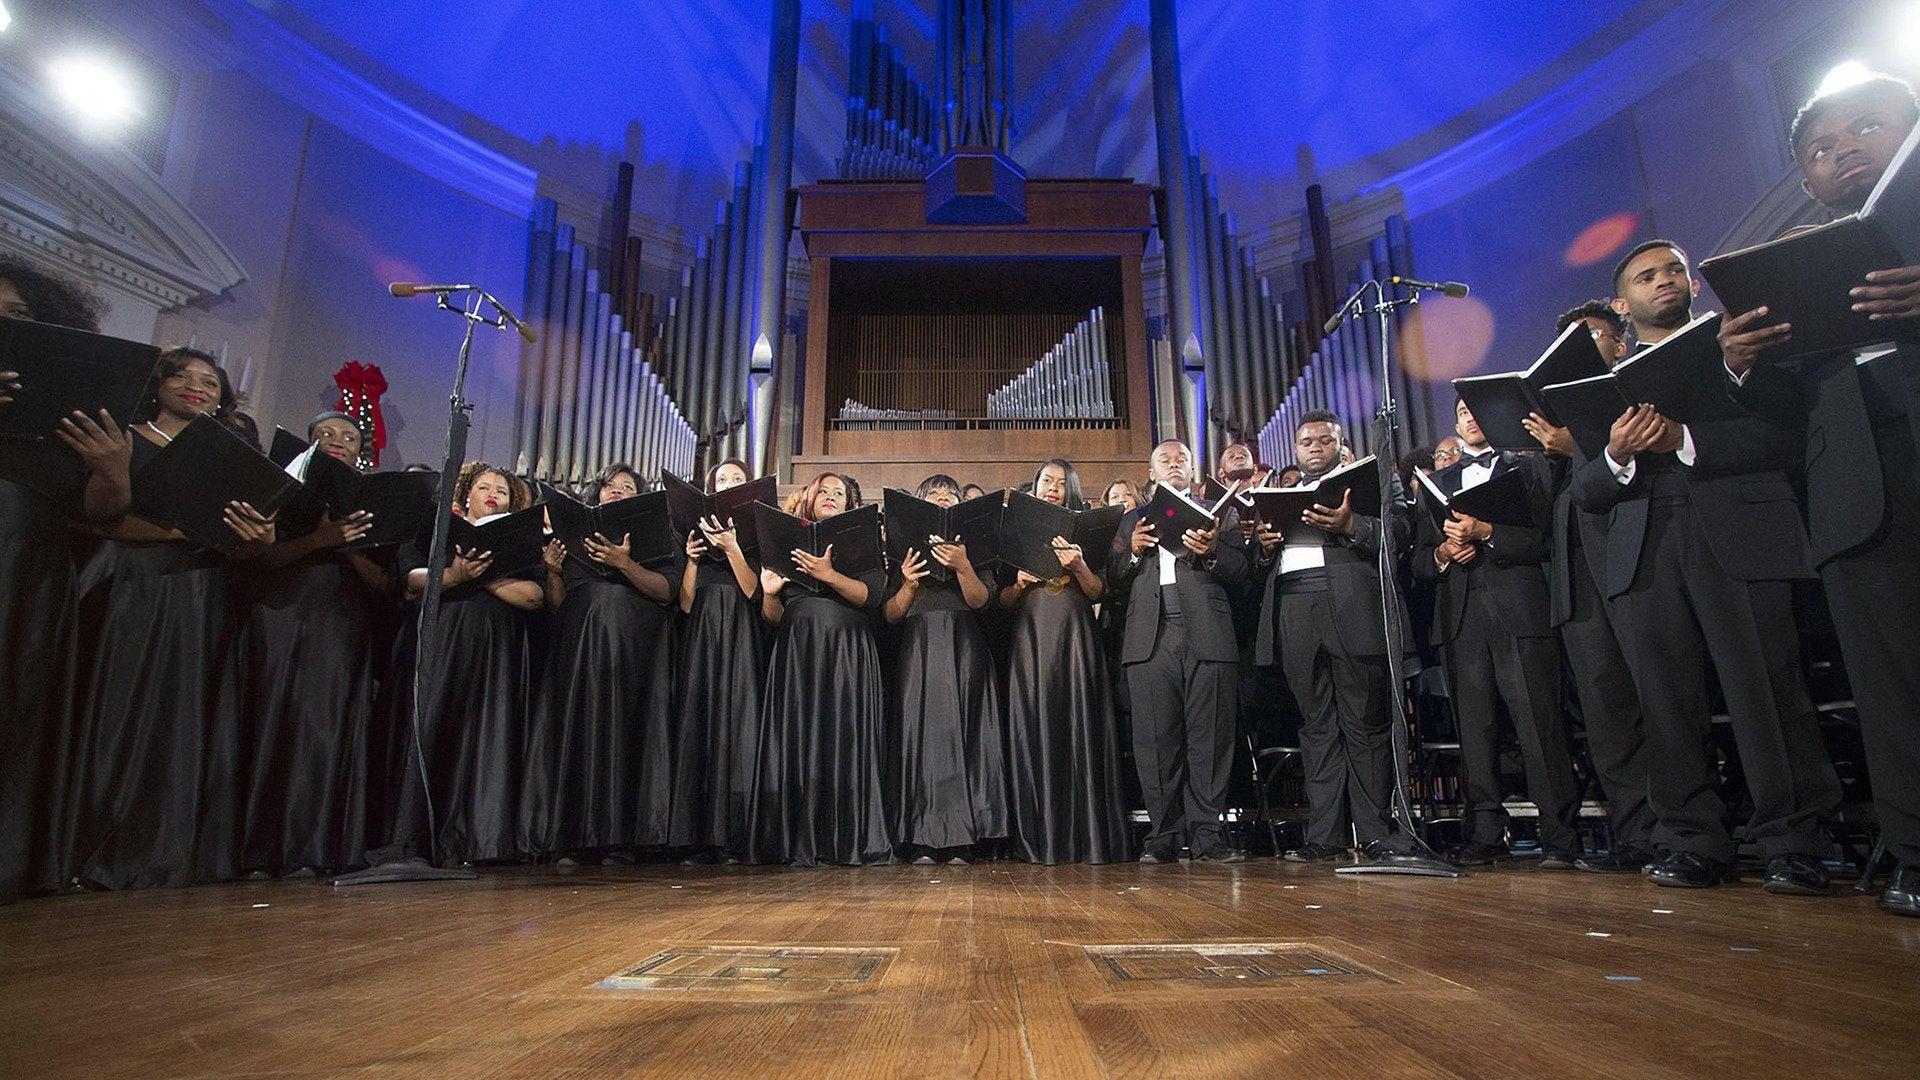 Morehouse-Spelman Christmas Carol Concert